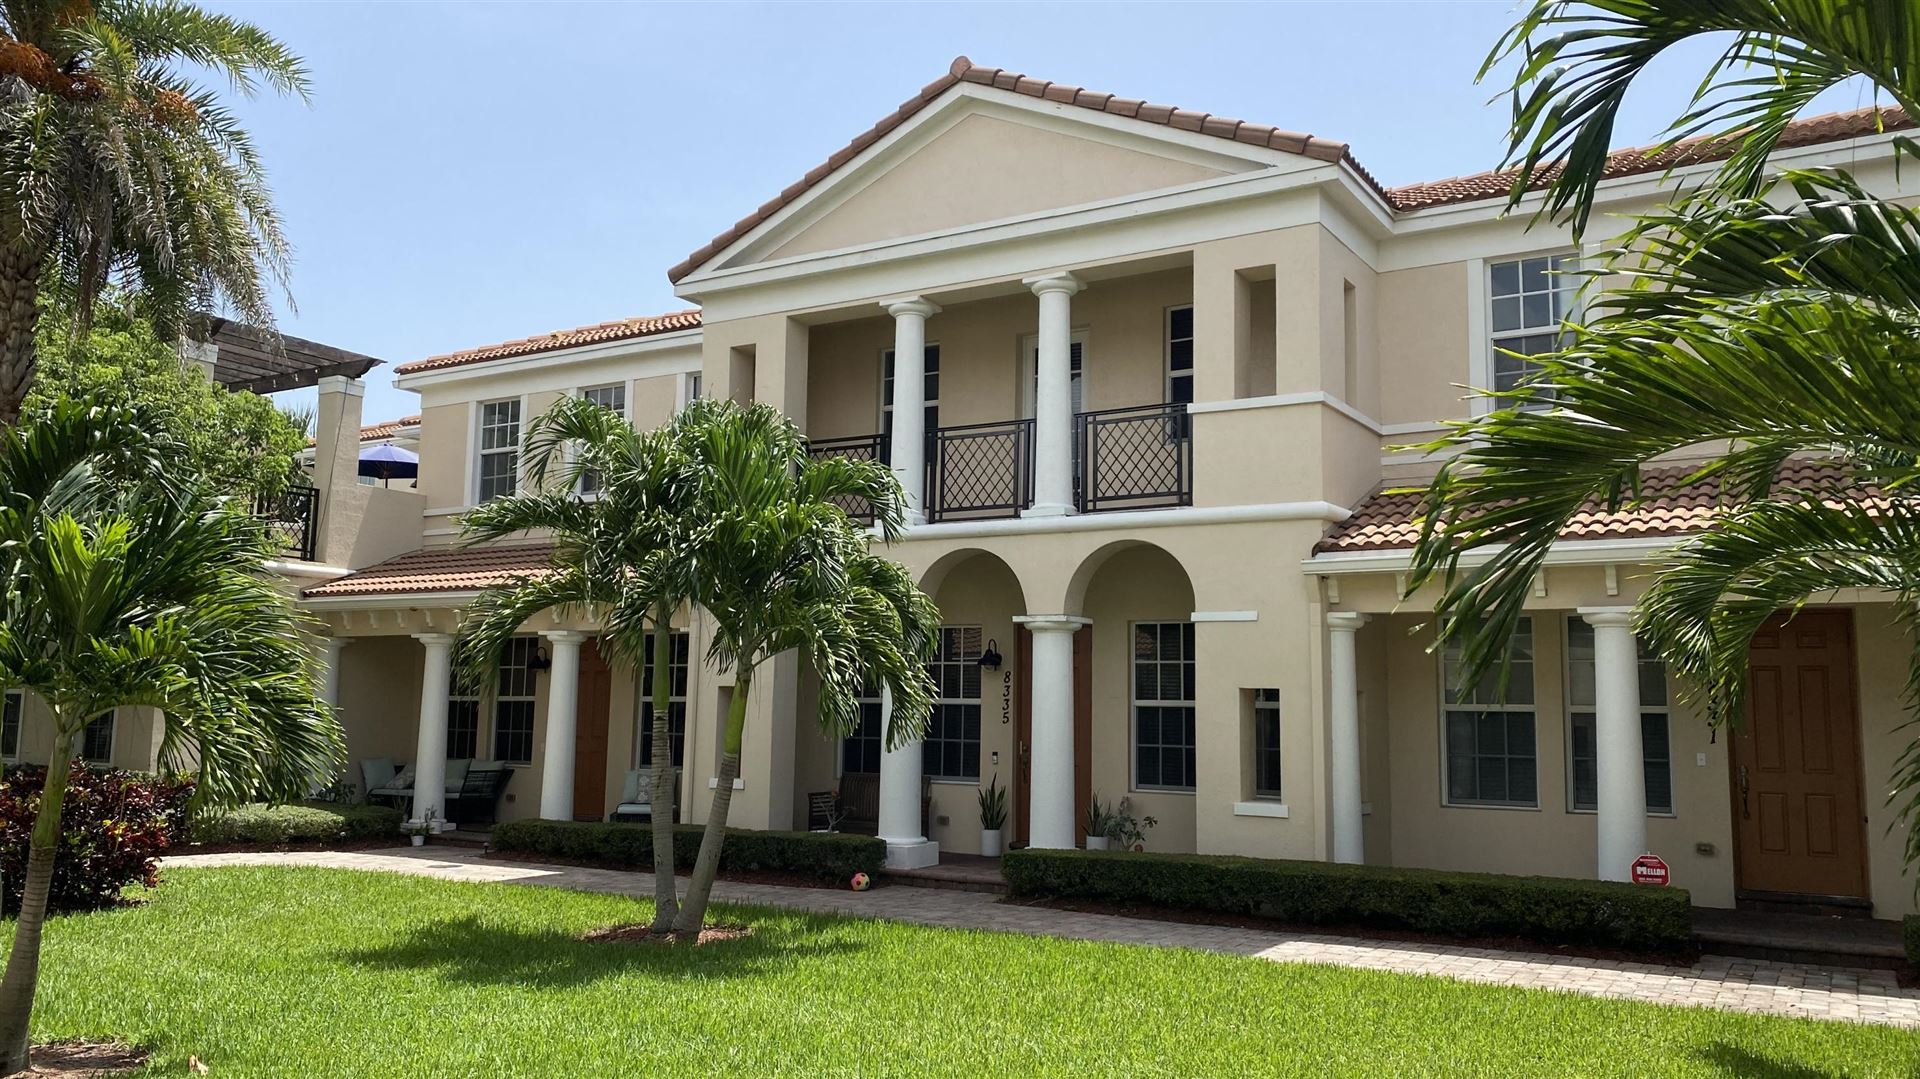 8335 NW 7th Court, Boca Raton, FL 33487 - #: RX-10634661